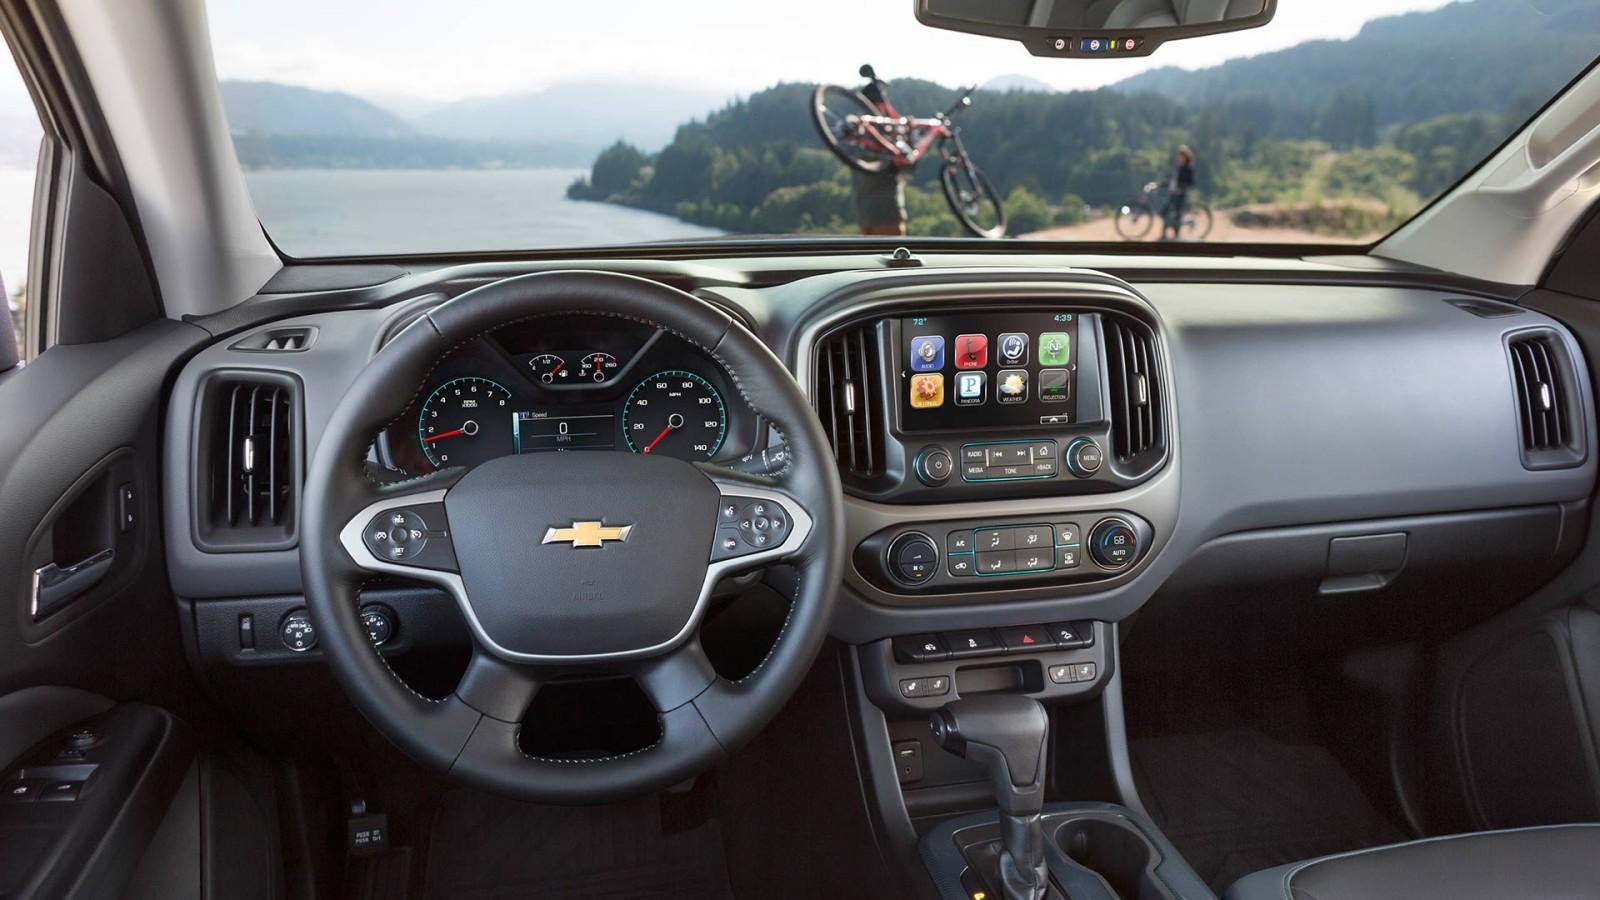 Chevrolet Colorado Lease Deals & Price   Grand Rapids MI